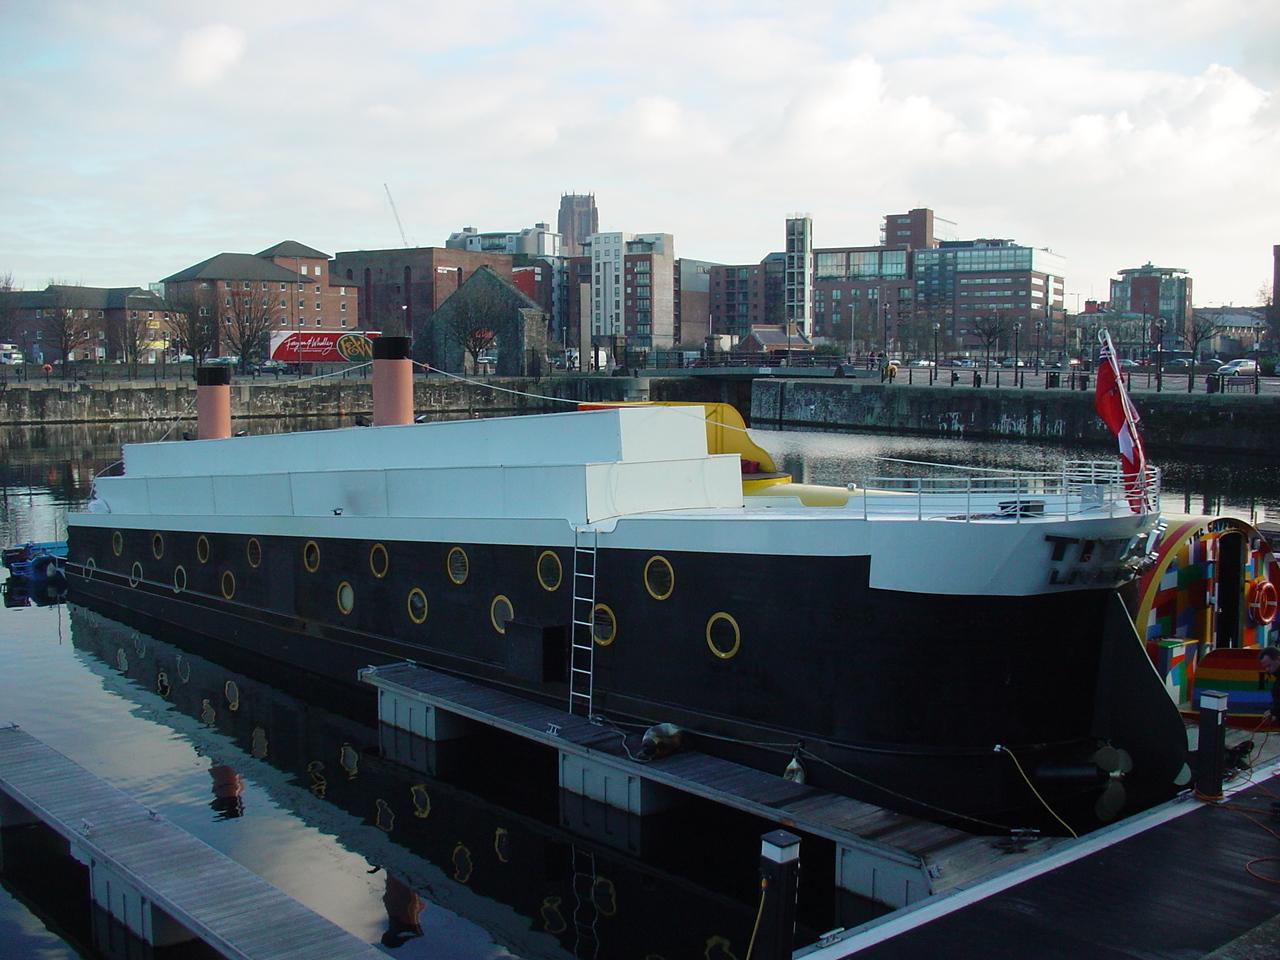 Titanic_Liverpool_hotel